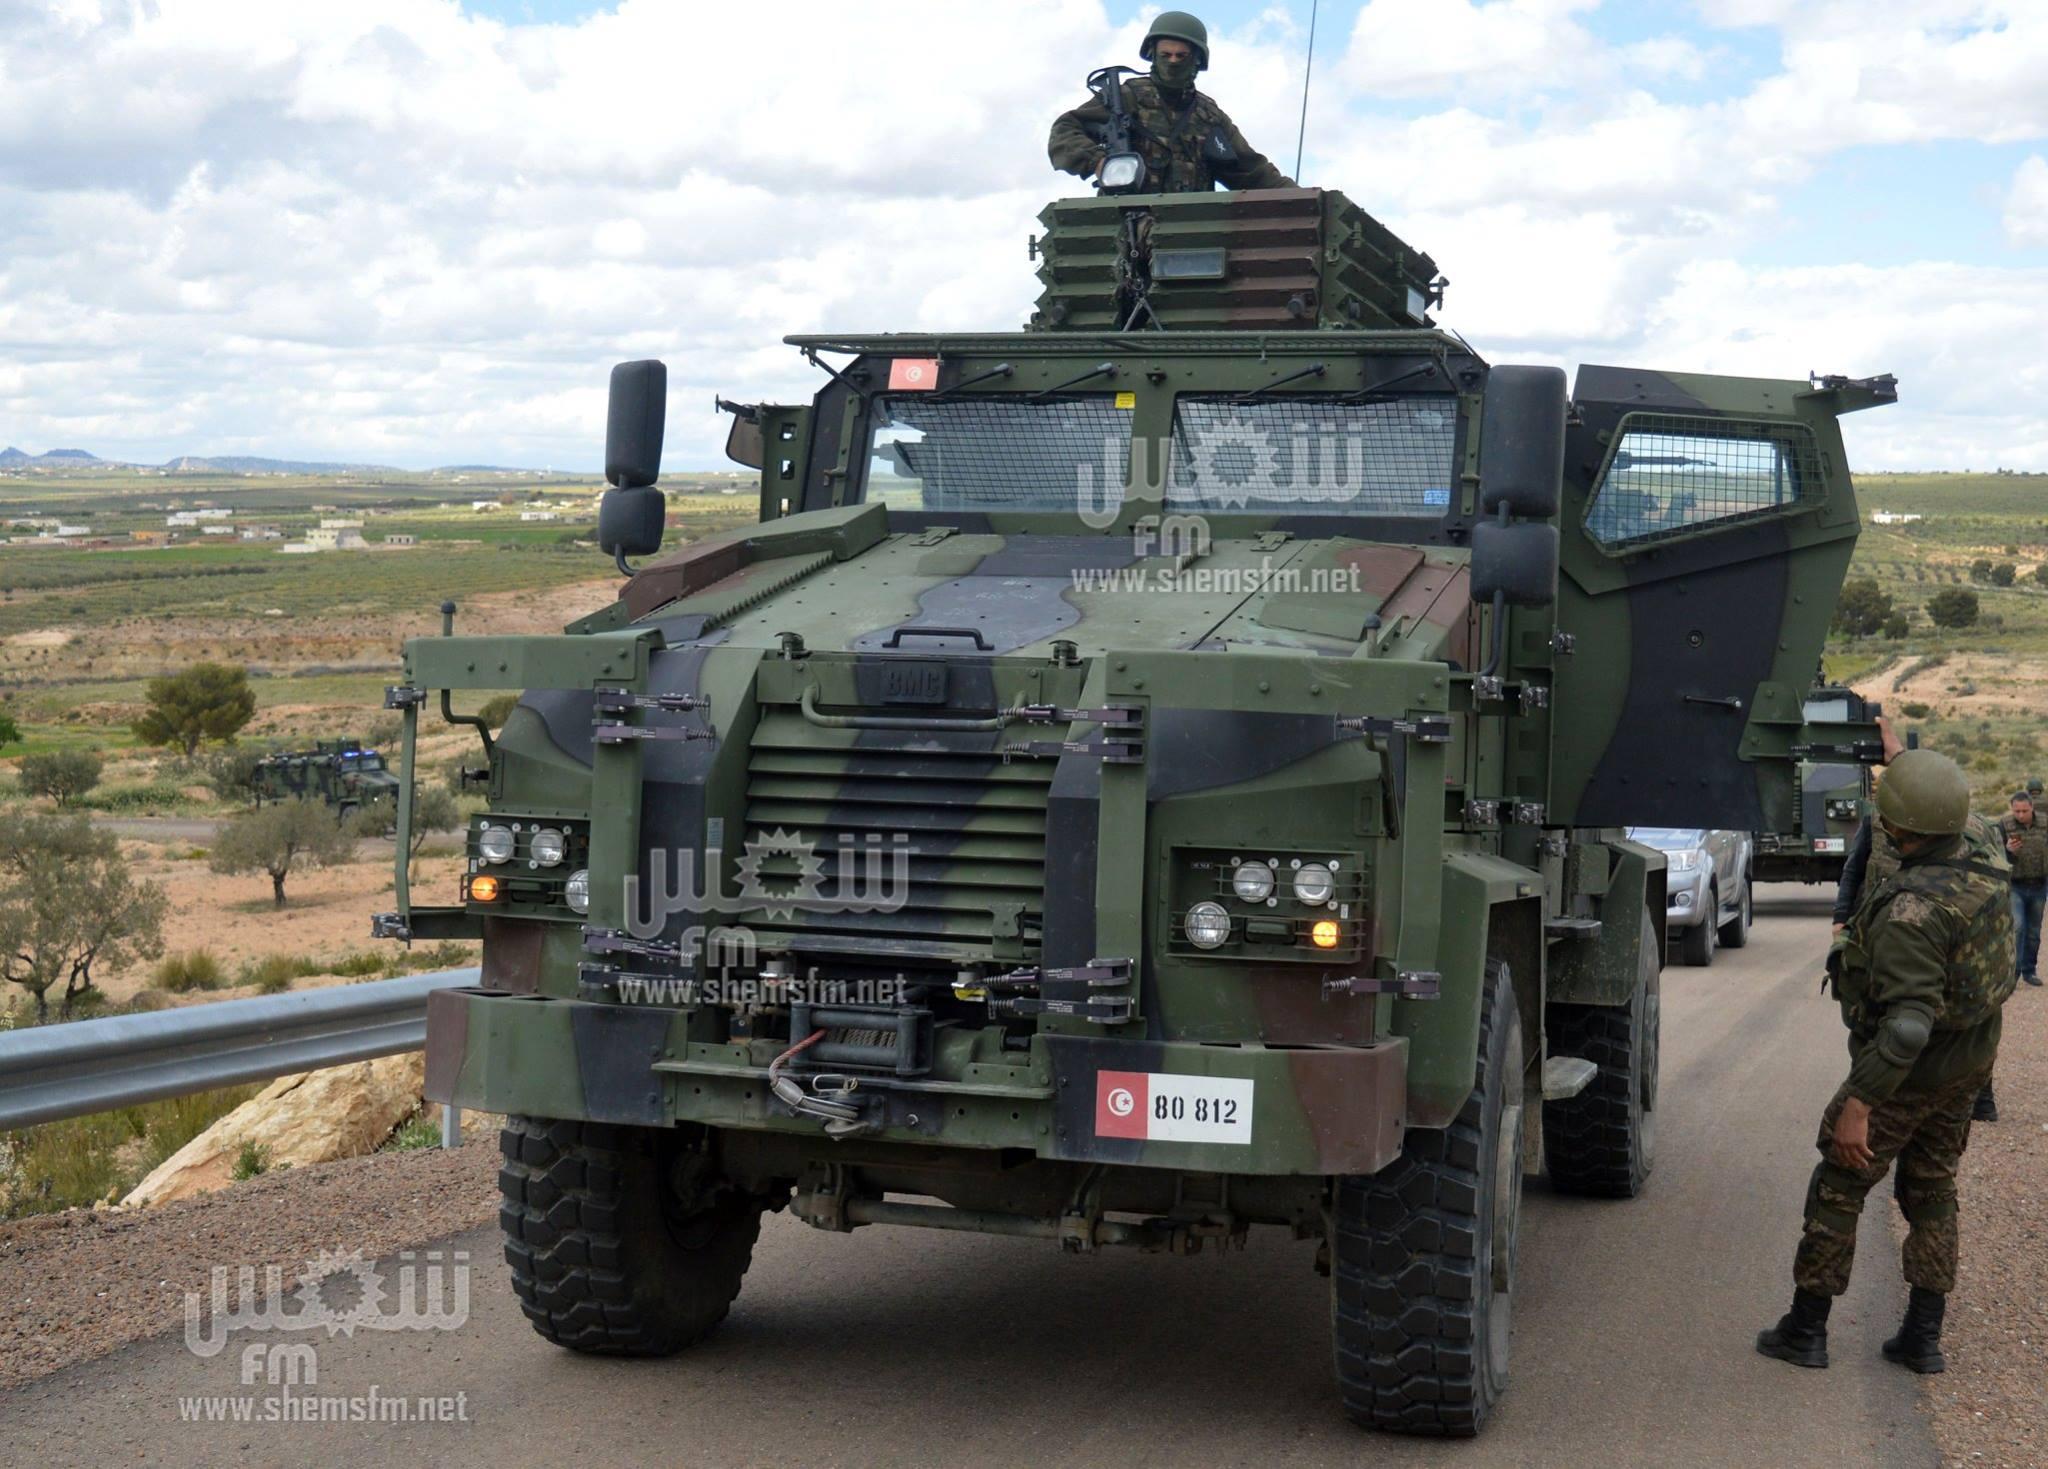 Armée Tunisienne / Tunisian Armed Forces / القوات المسلحة التونسية - Page 16 56922729-2444554535565817-7483445347470016512-o